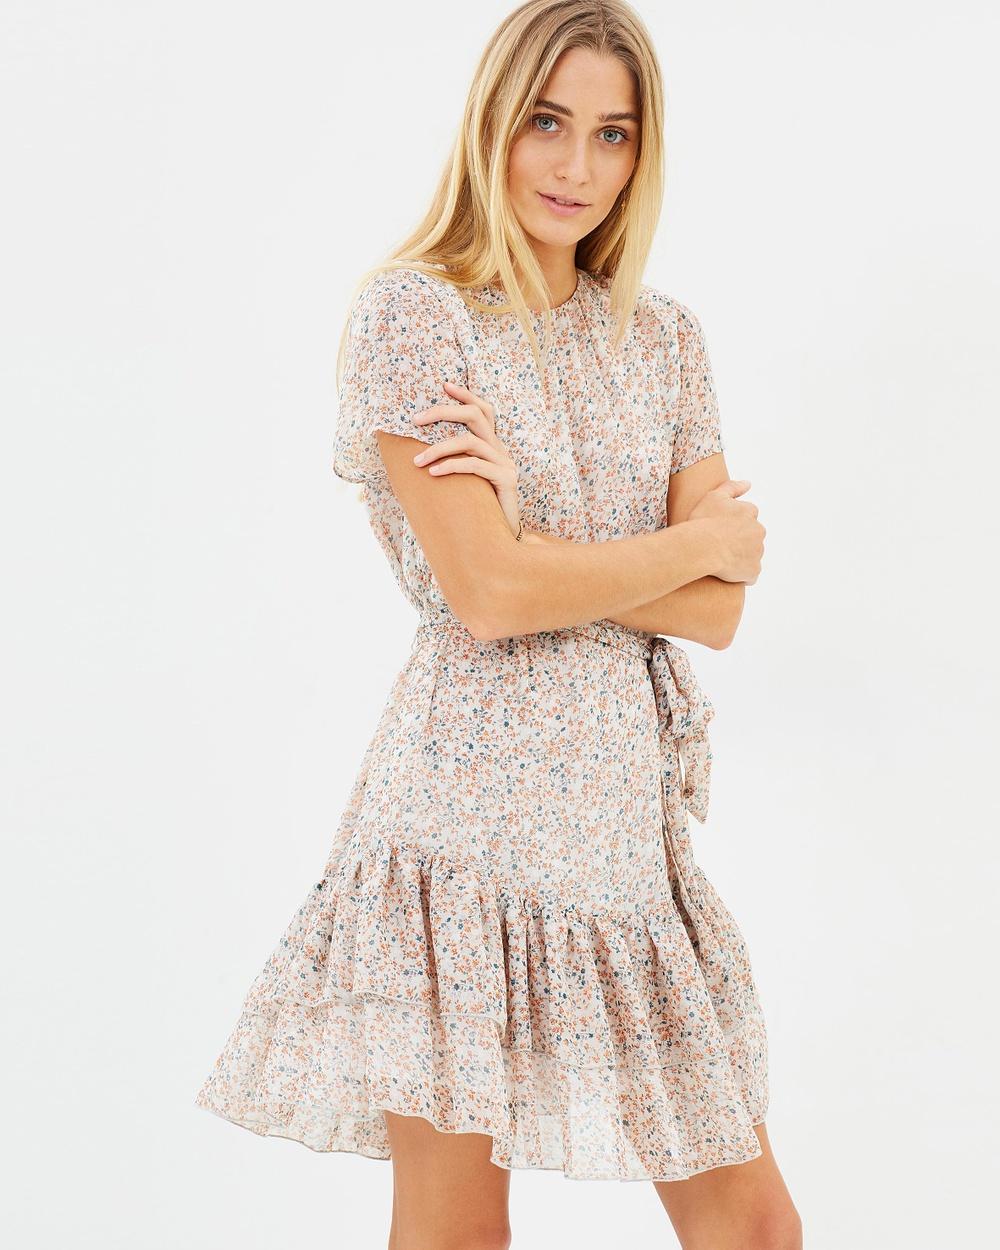 The East Order Cosette Mini Dress Printed Dresses Peach Dahlia Floral Cosette Mini Dress